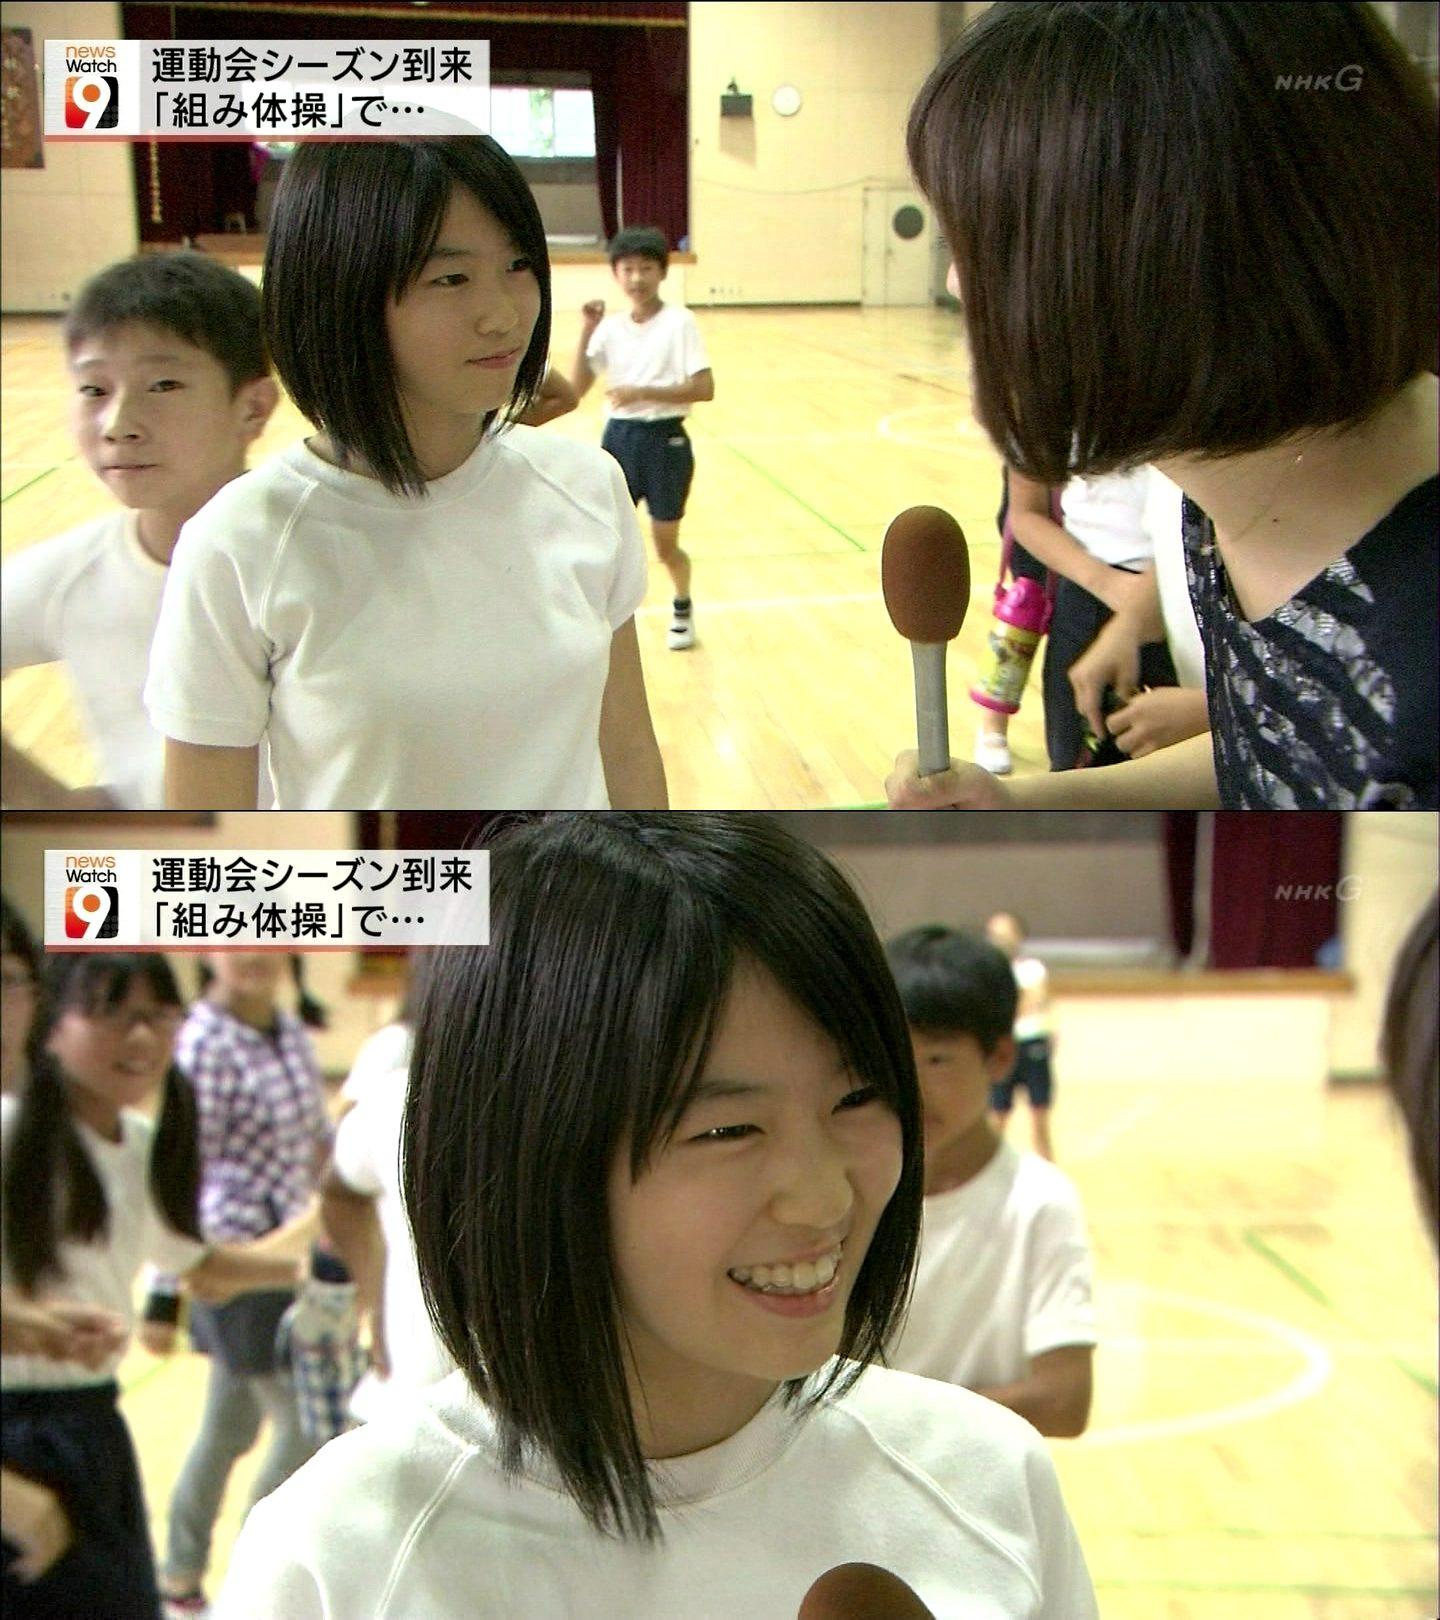 NHK「NHKニュースウオッチ9」でインタビューに答えた可愛すぎる女子小学生